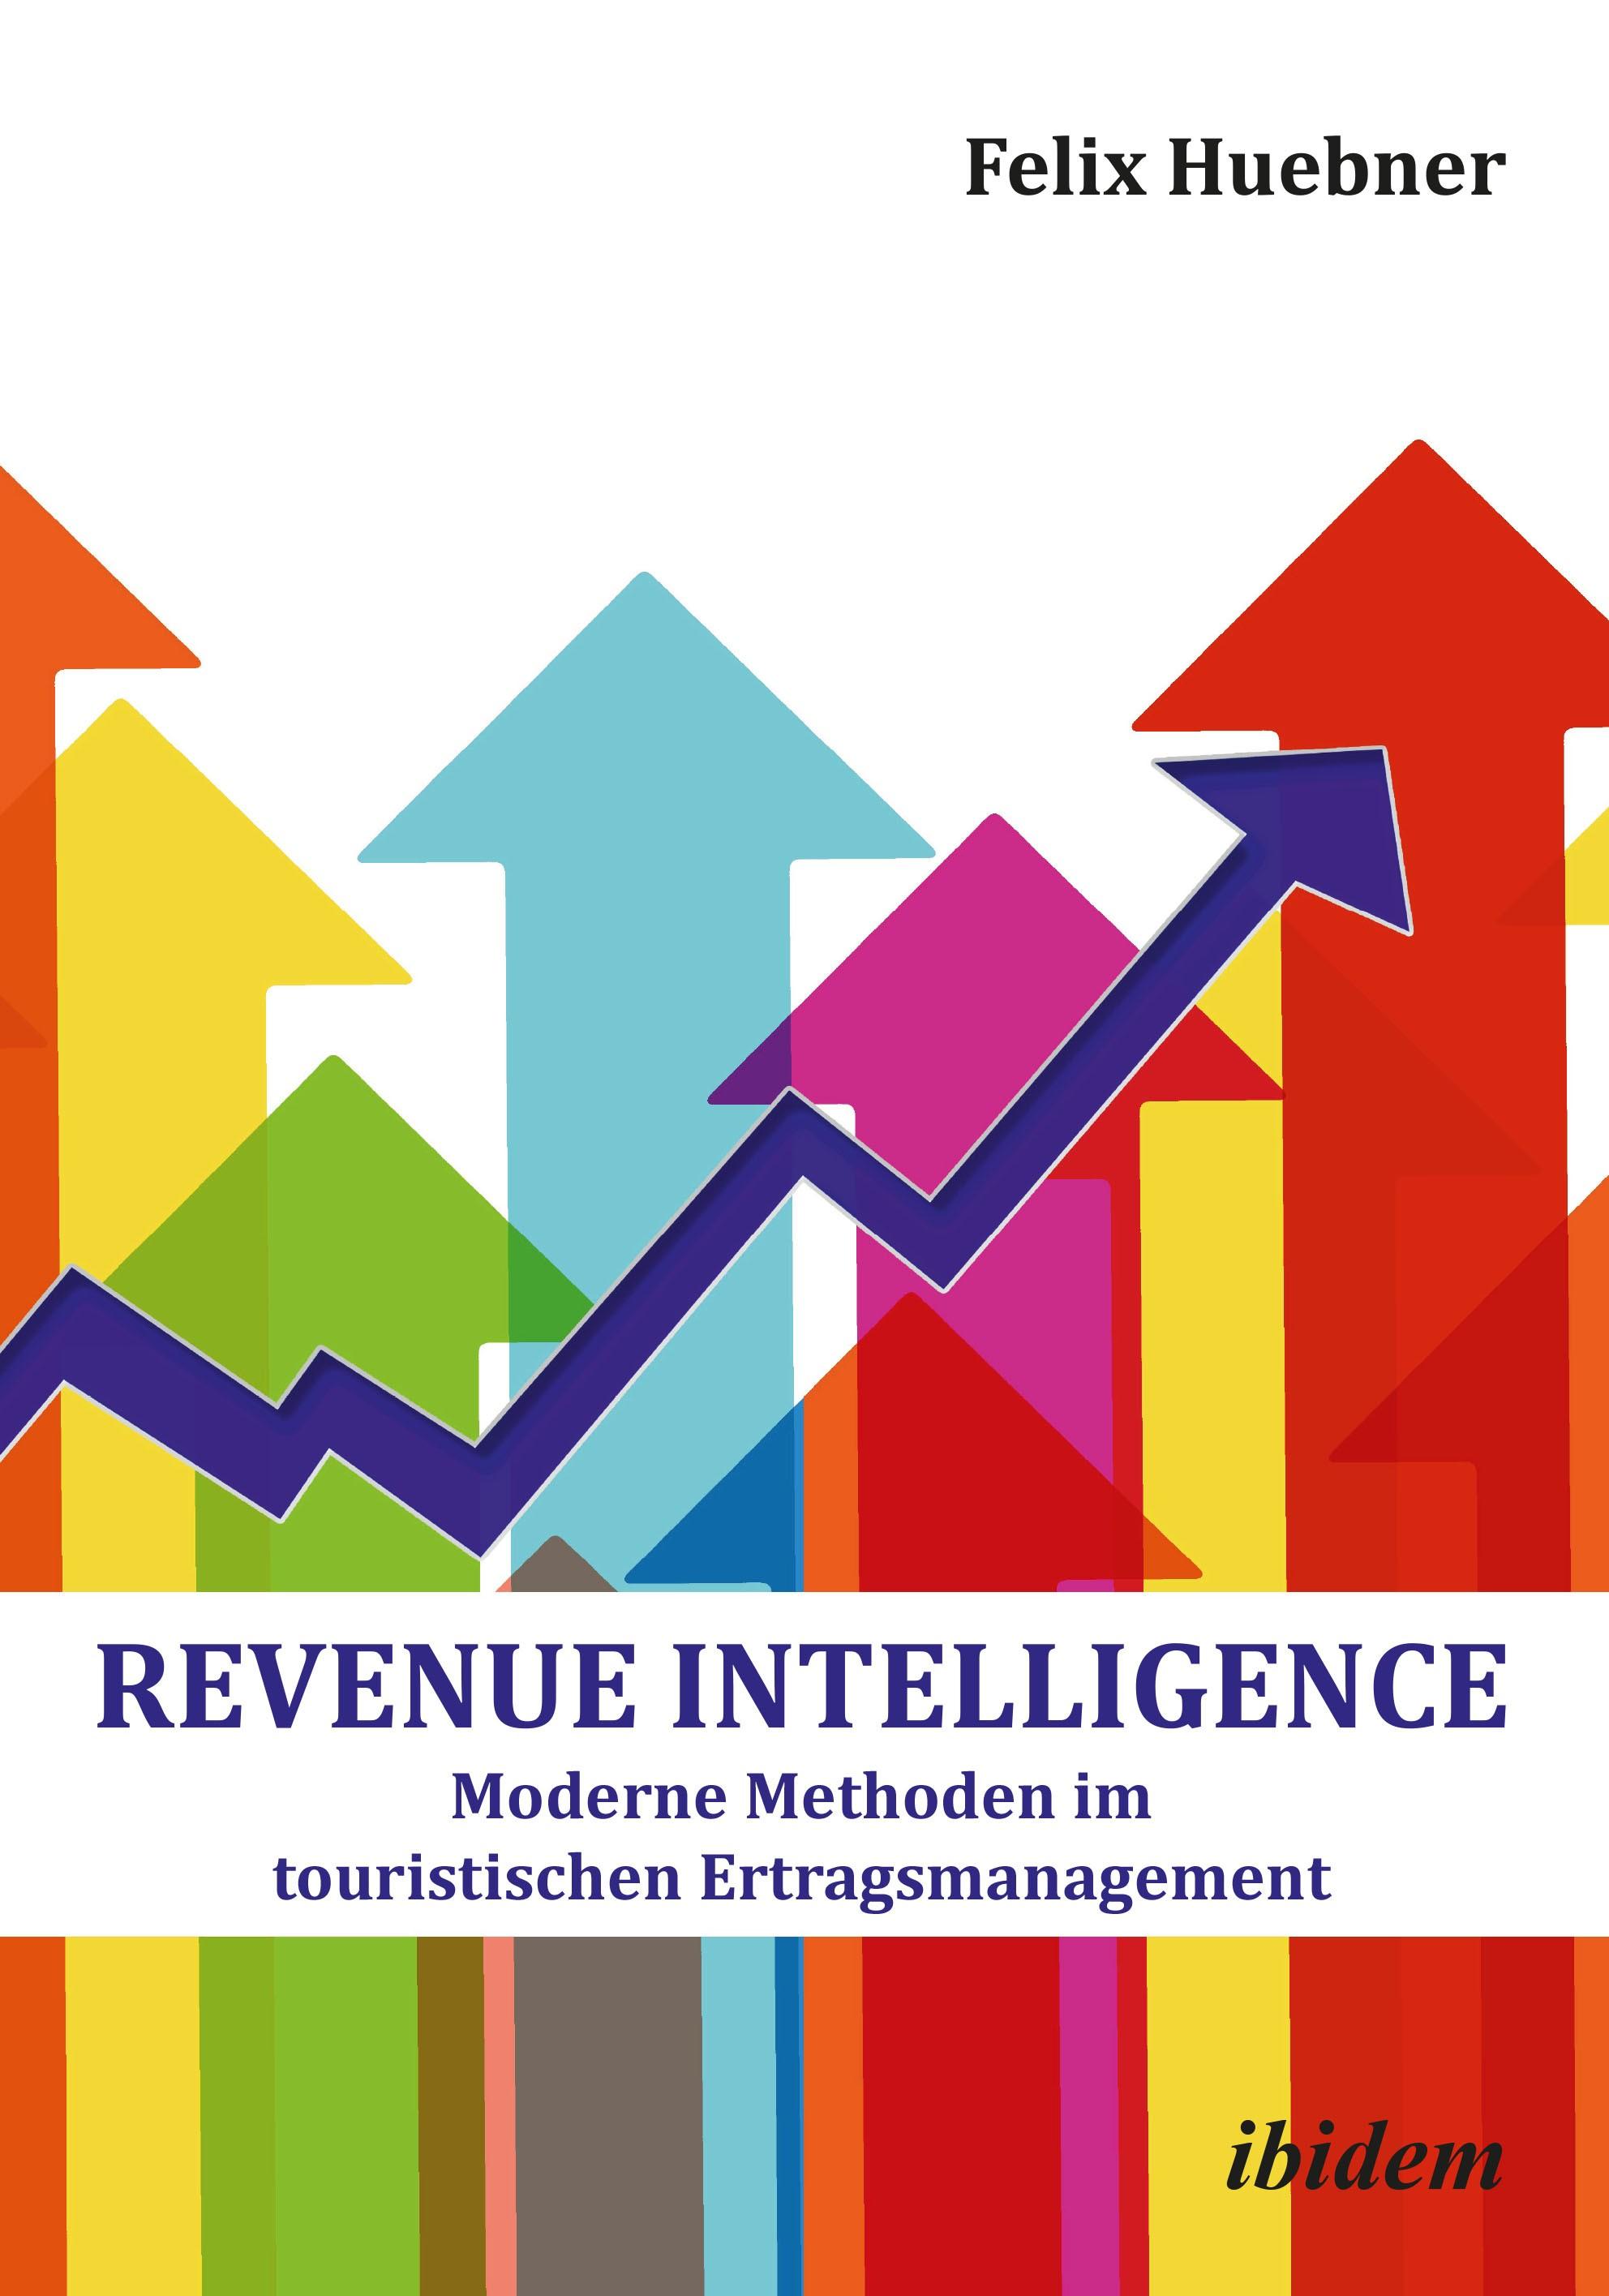 Revenue Intelligence